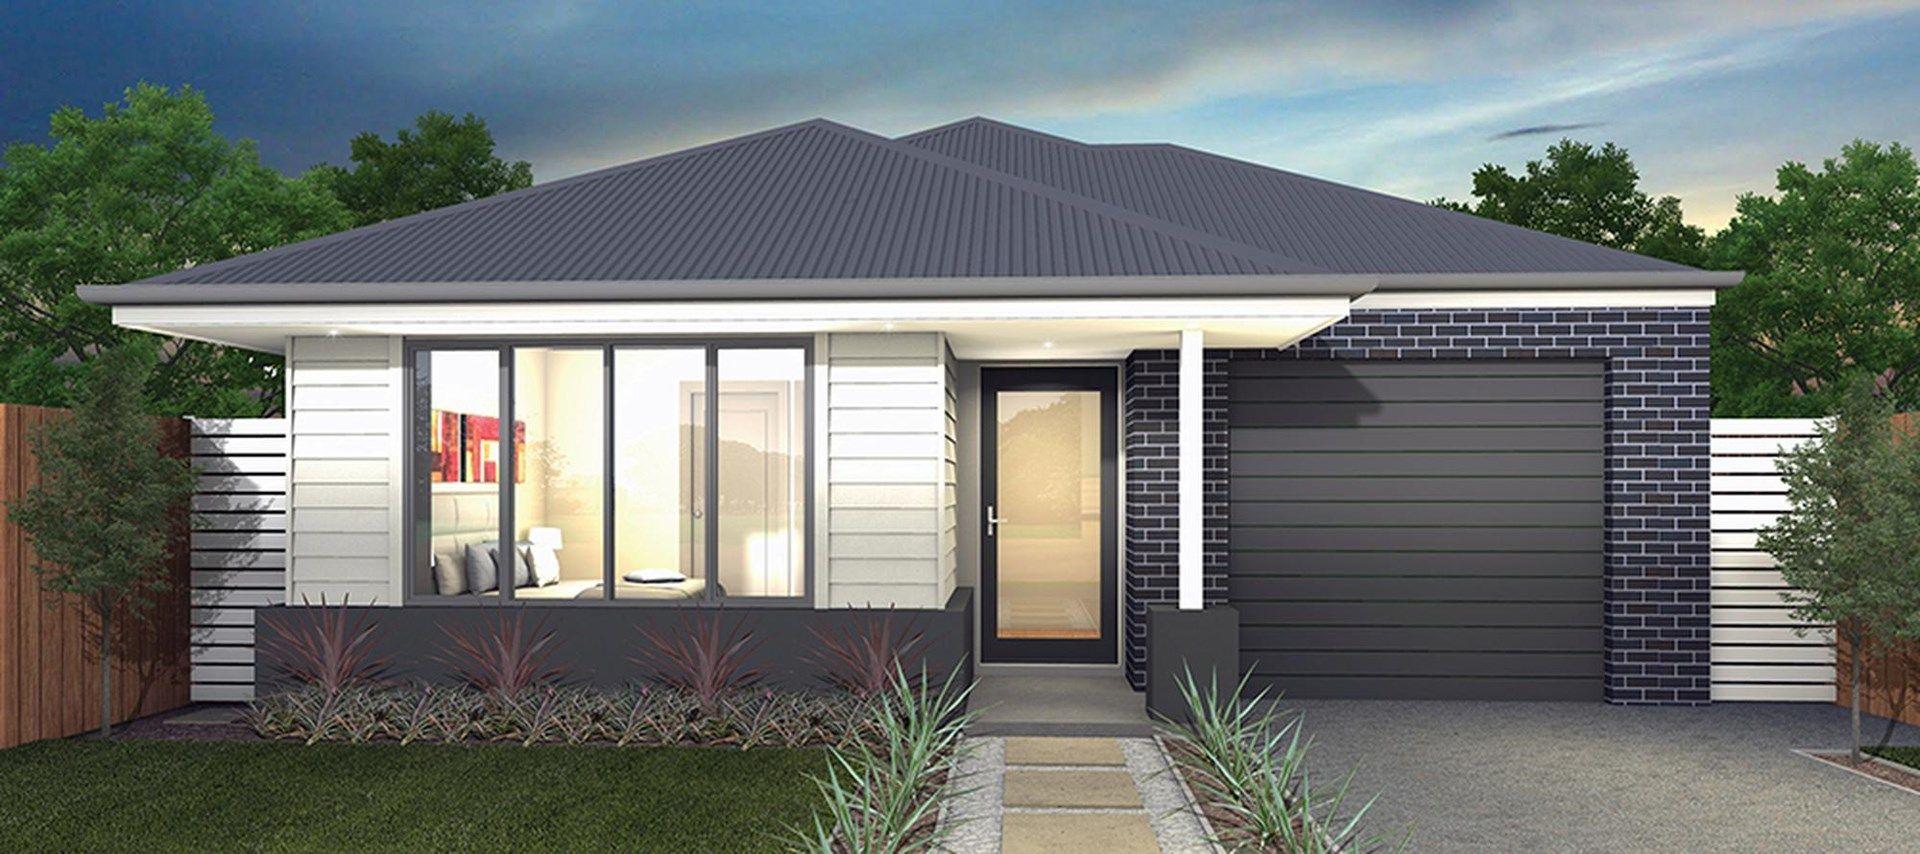 732 Turnstone Vista, South Nowra NSW 2541, Image 0